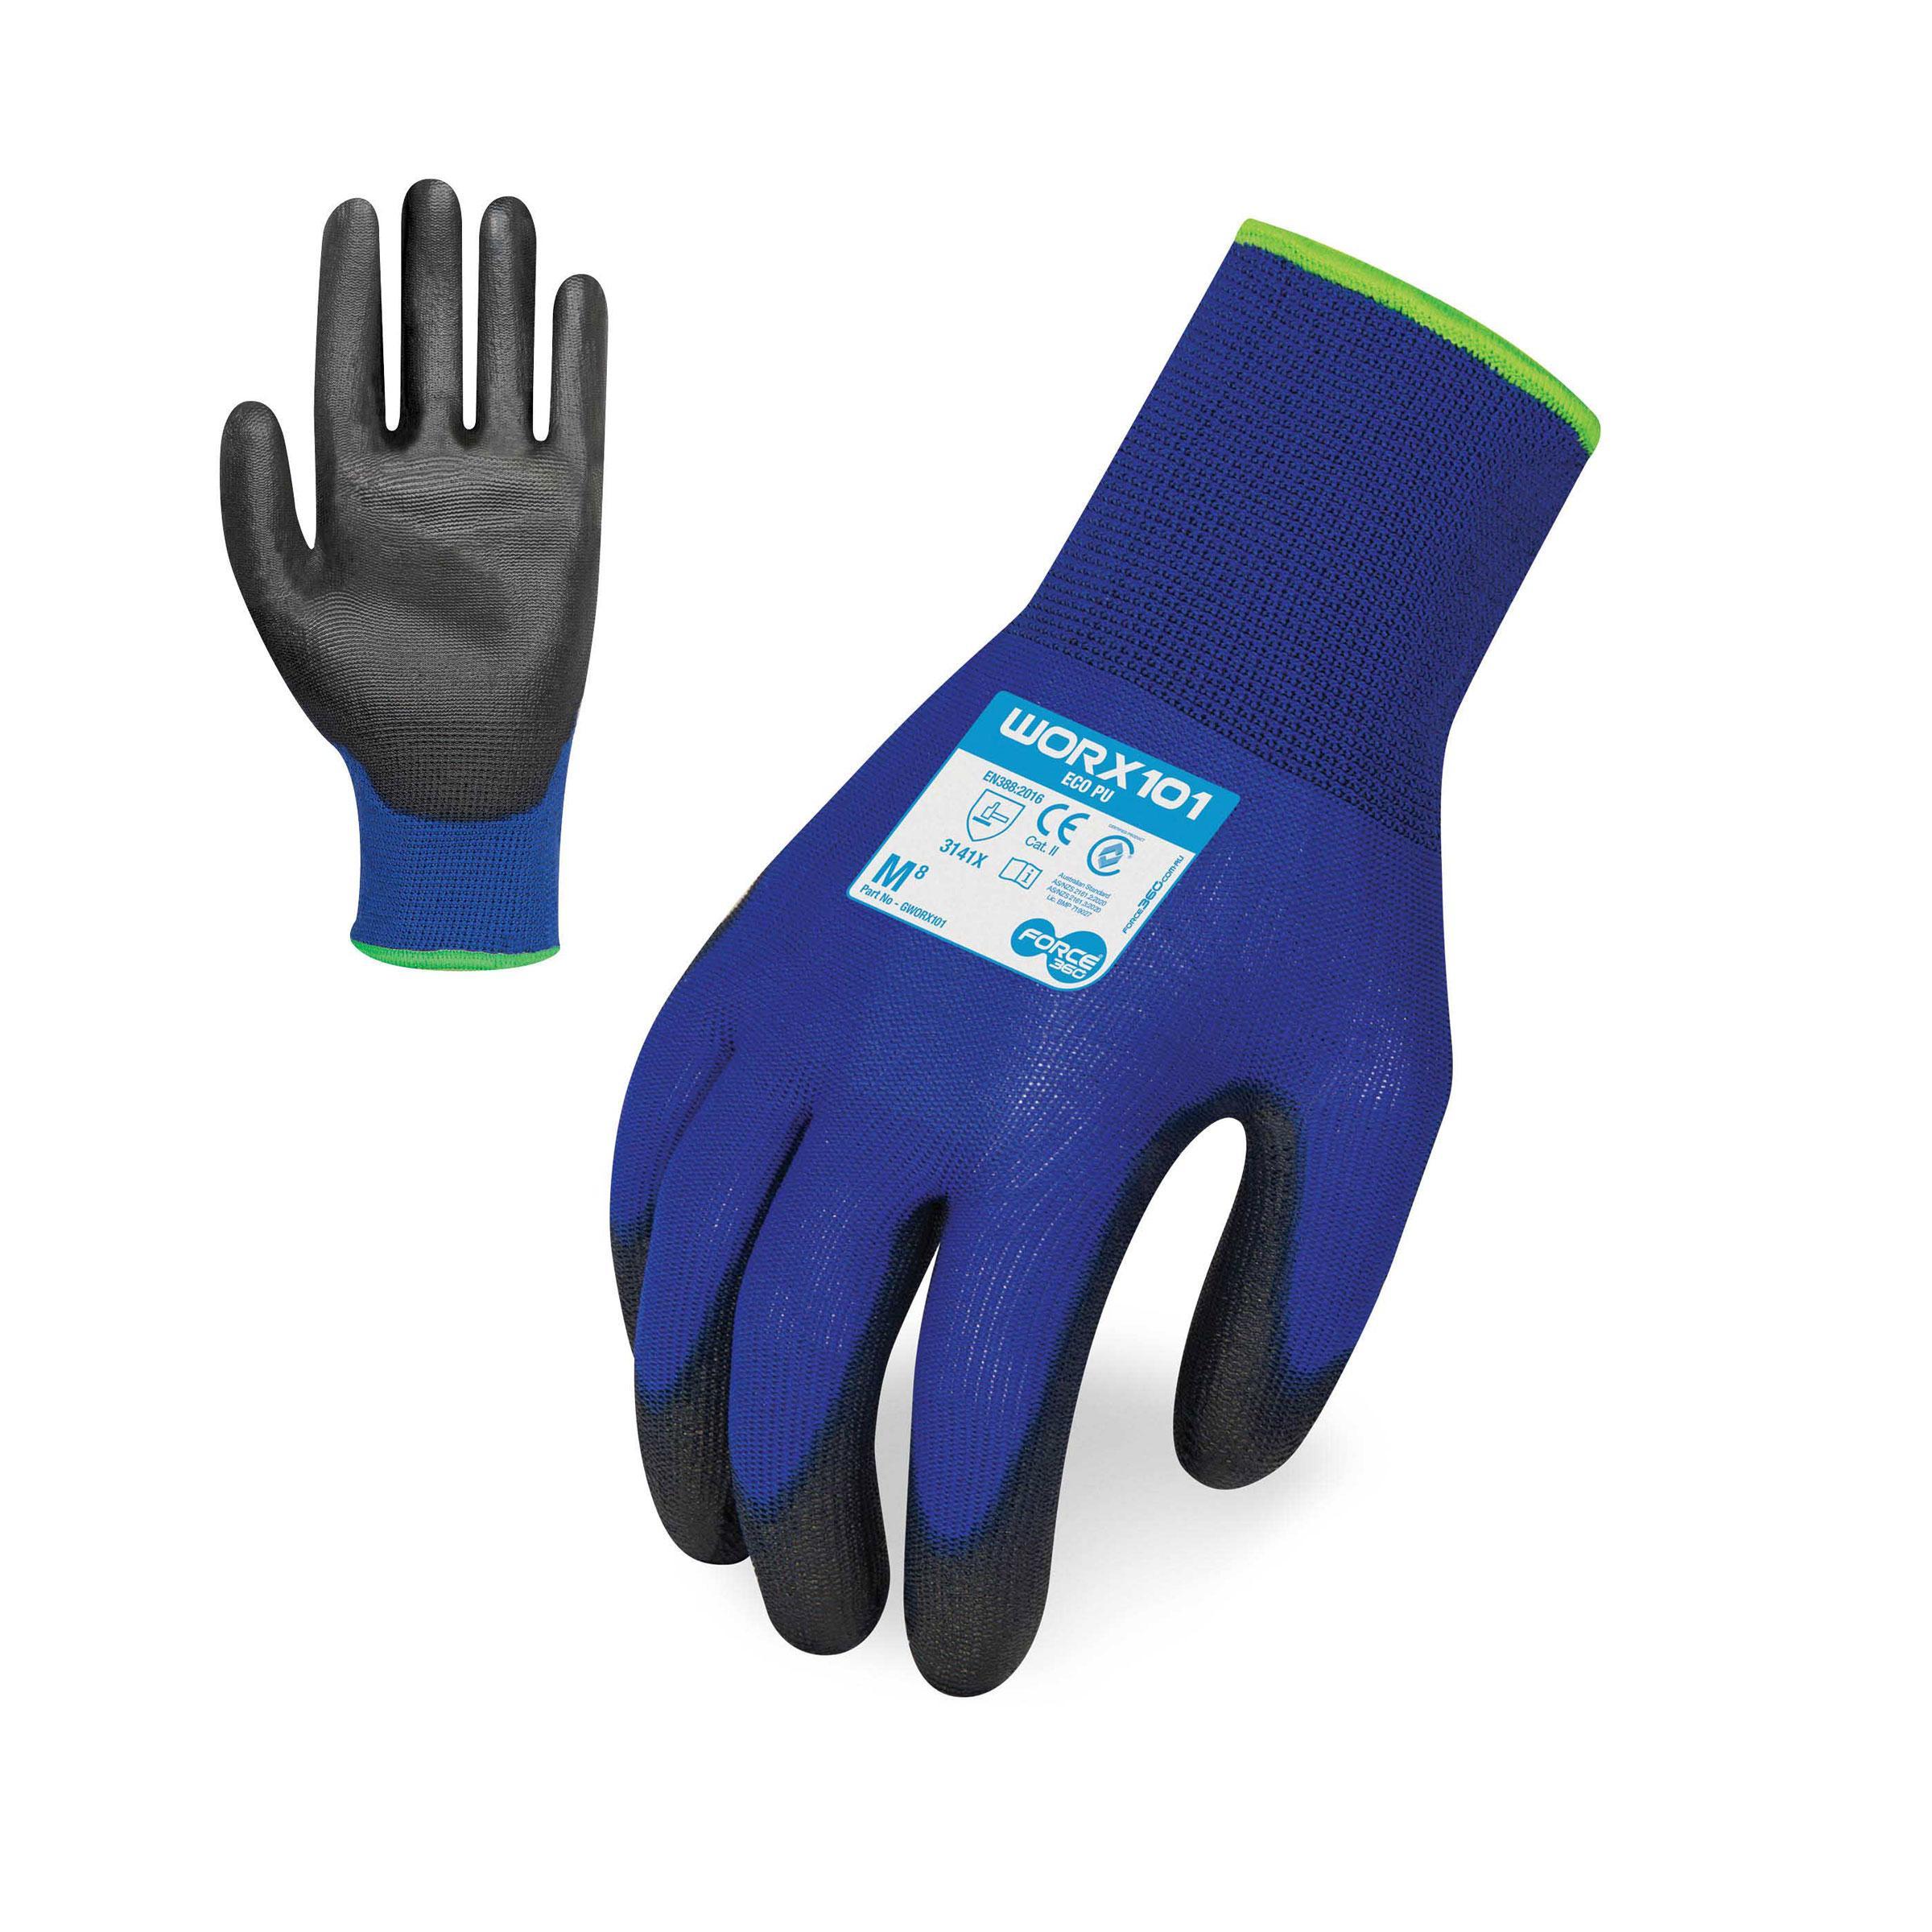 FORCE360 GWORX101 - Glove Eco PU Grip Glove